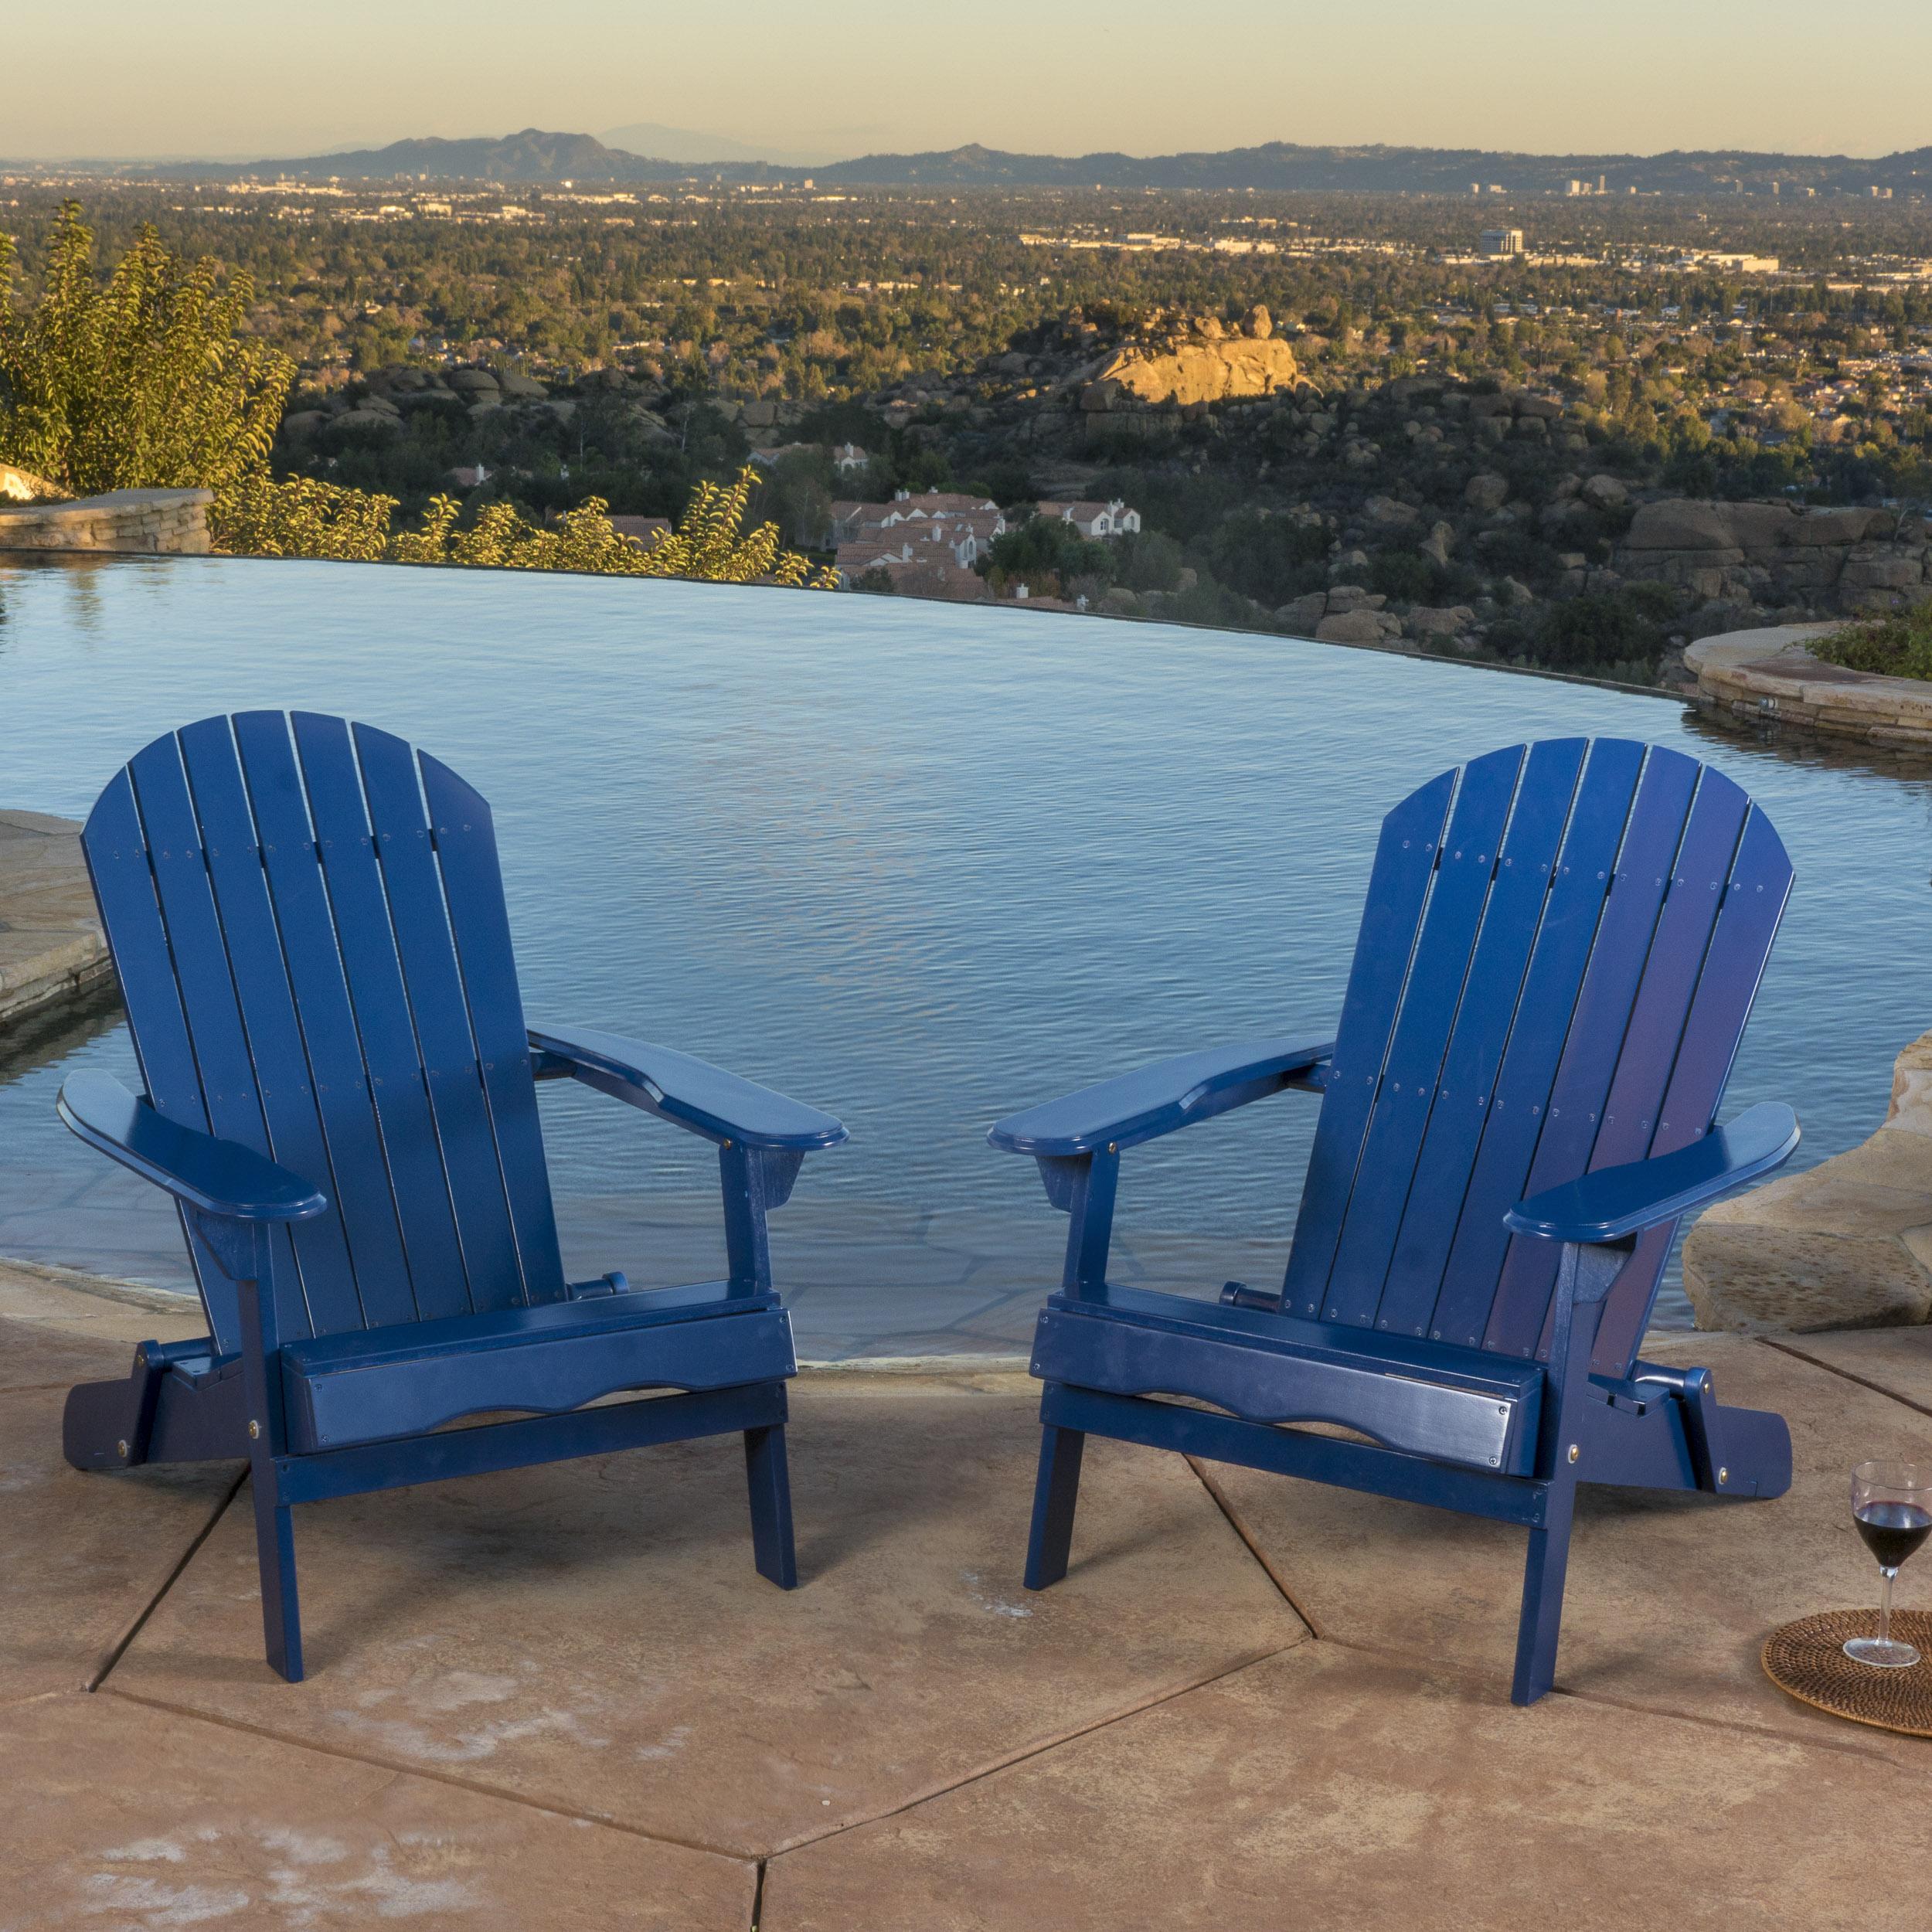 Horizon Folding Wood Adirondack Chair - Pack of 2,Navy Blue